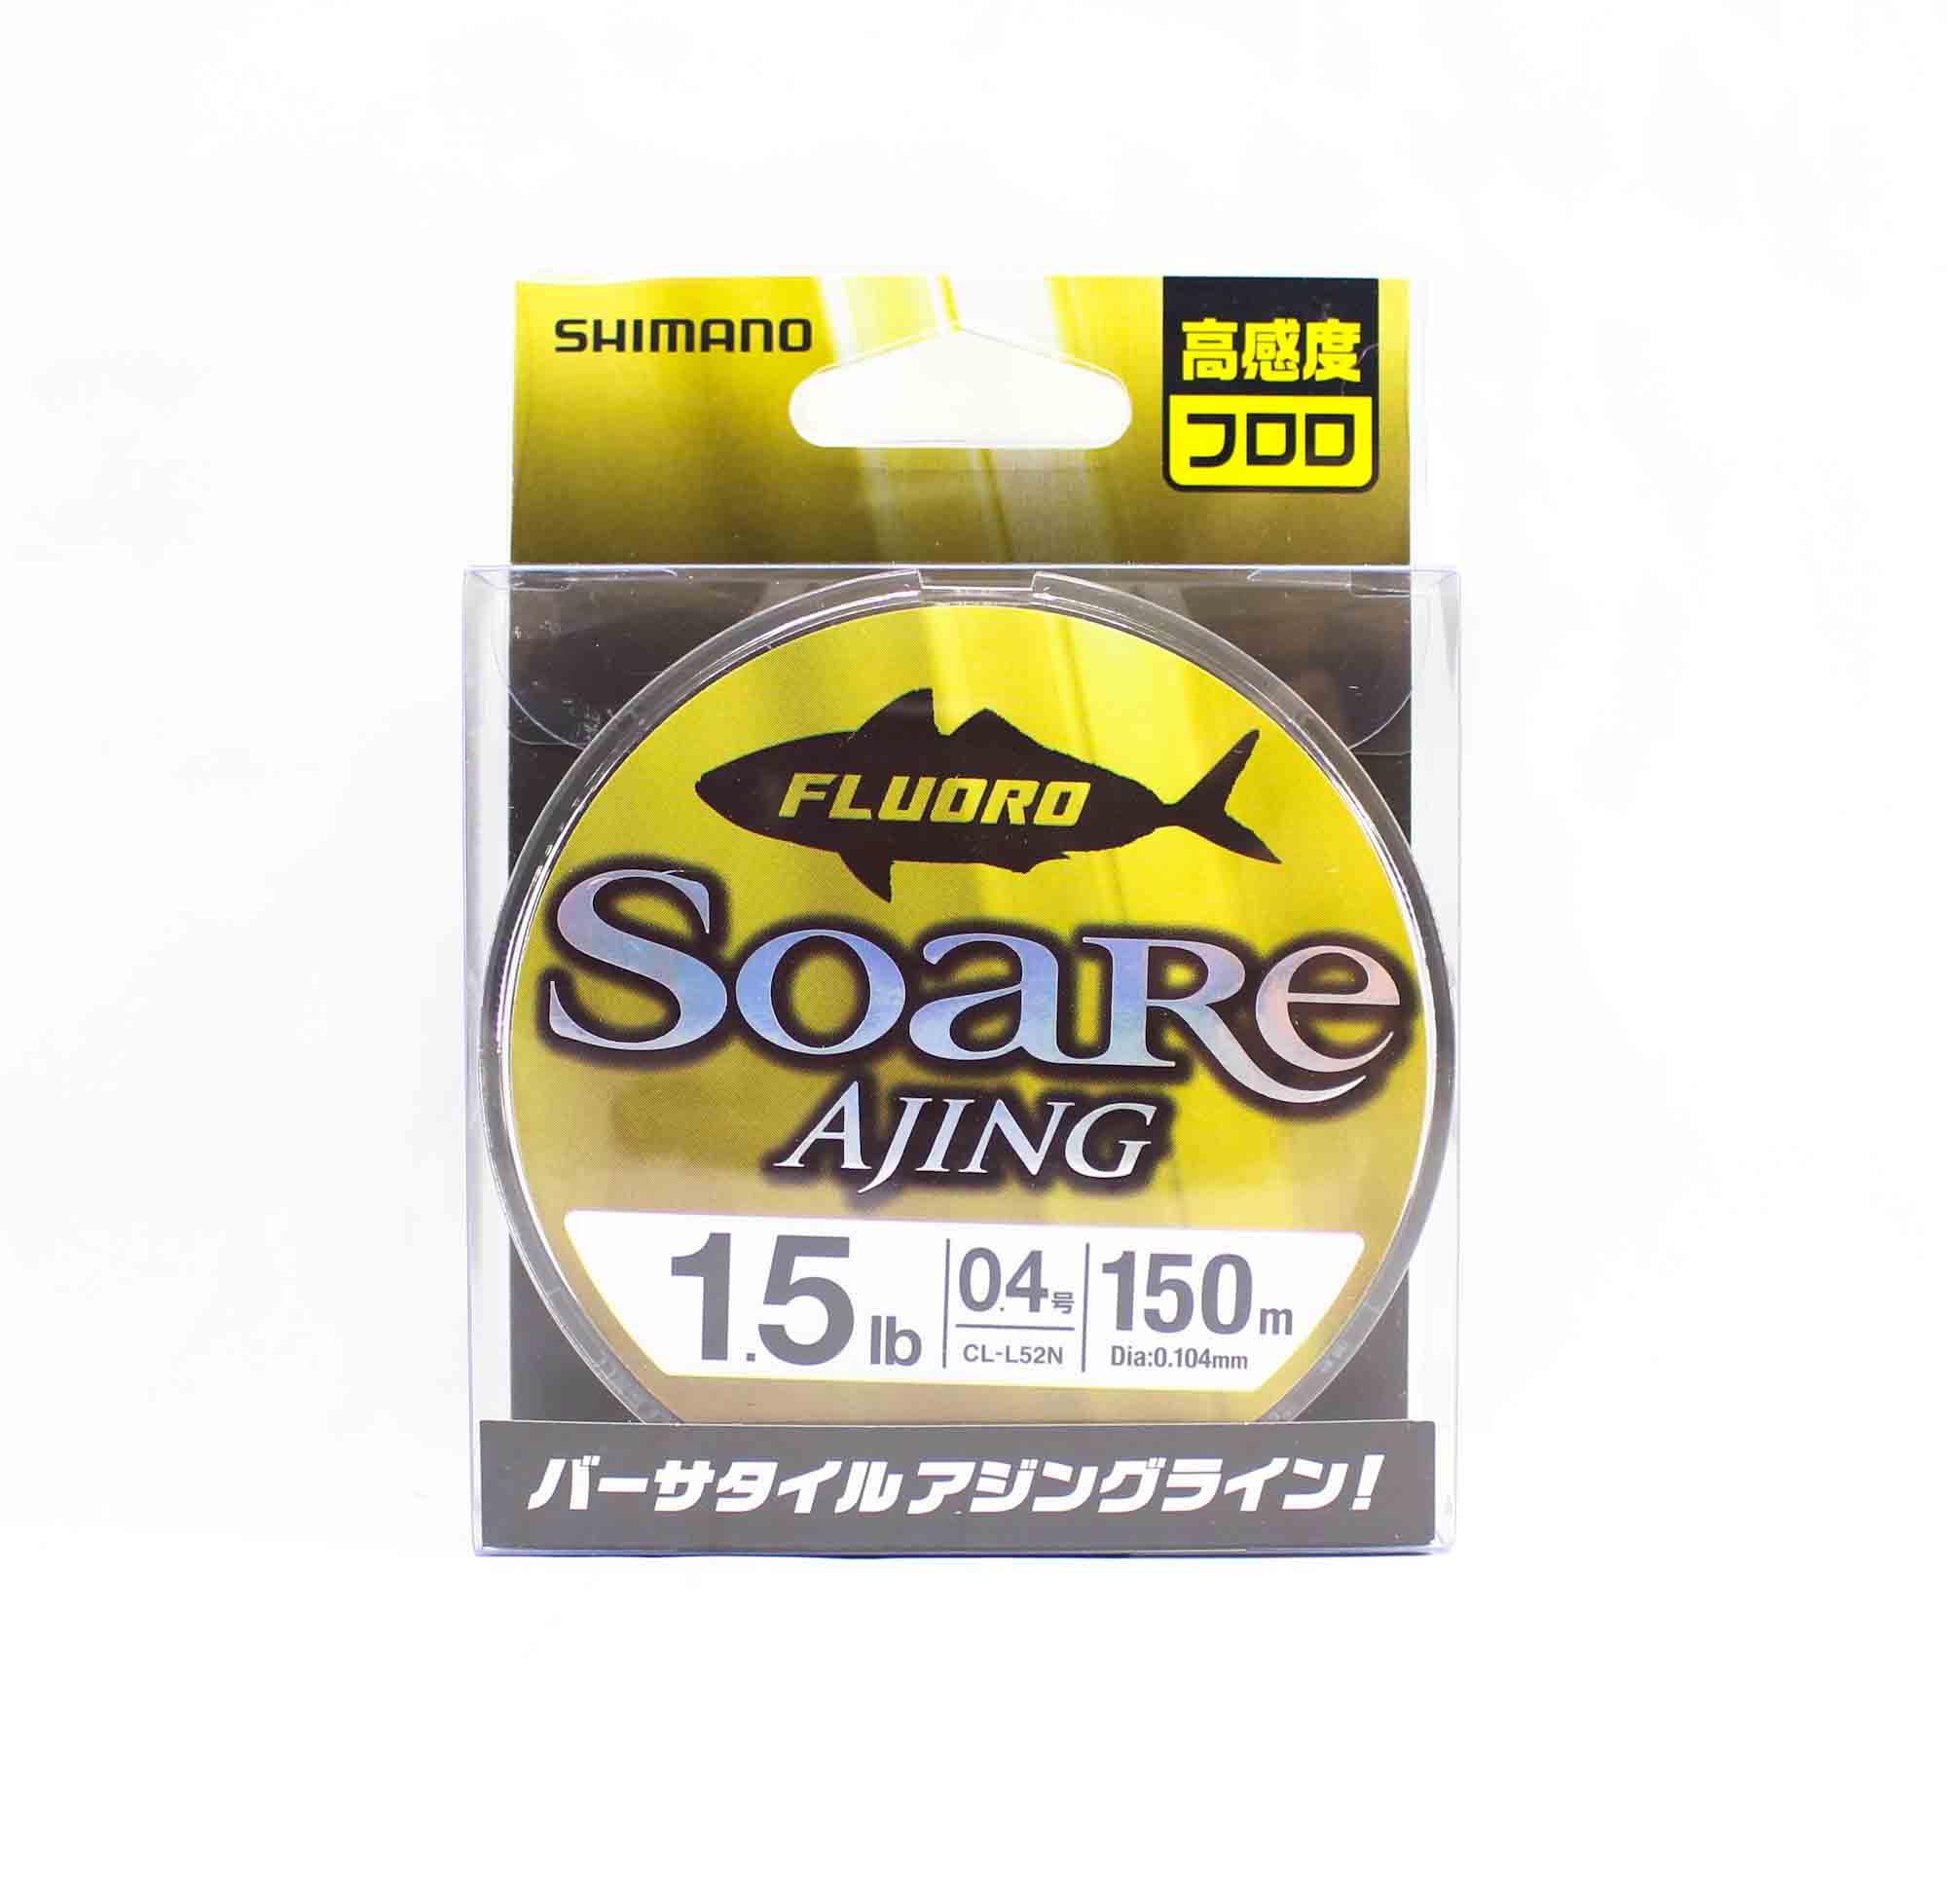 Shimano CL-52N Soare Ajing Fluorocarbon Line 150m Size 0.4 1.5lb 442611